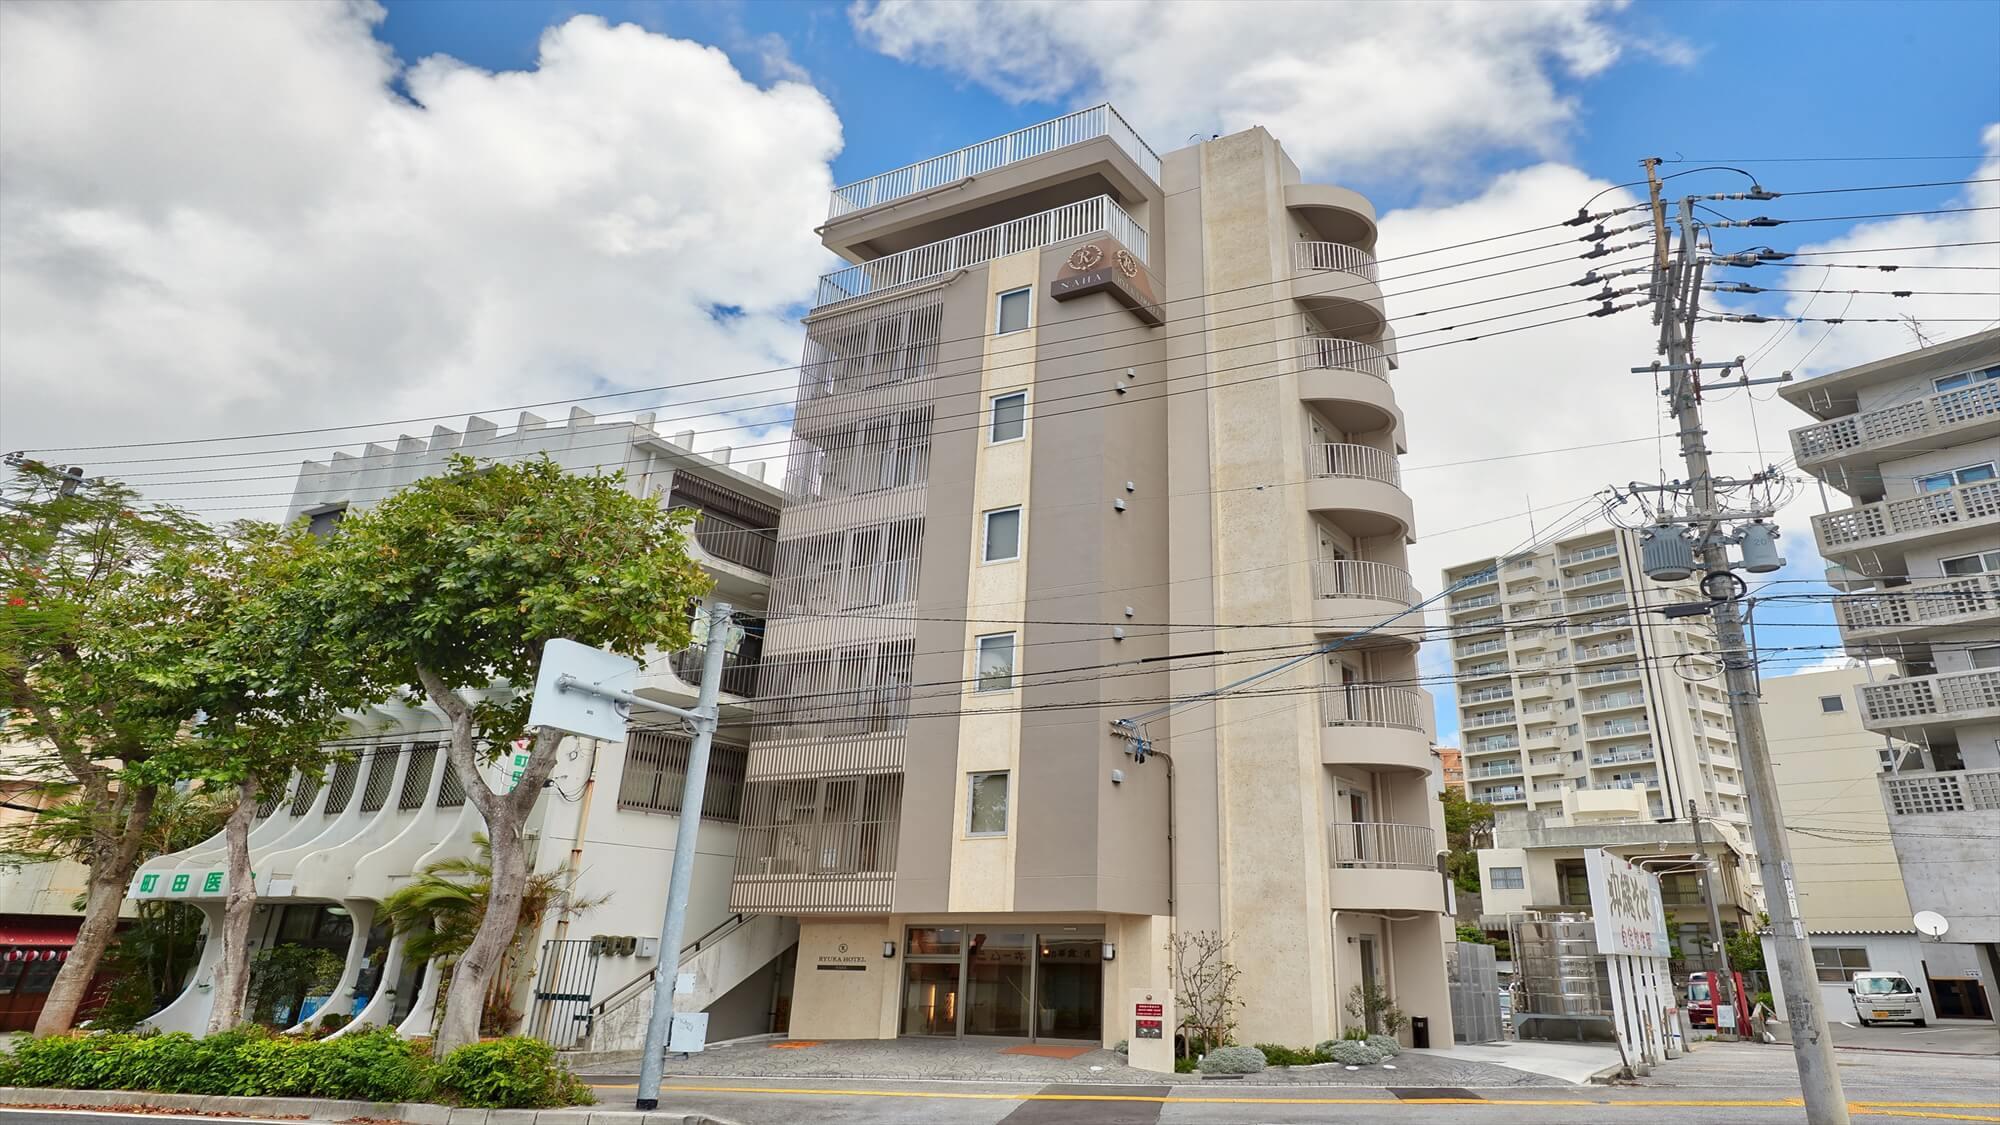 RYUKA HOTEL NAHA(琉華ホテル那覇)へようこそ♪